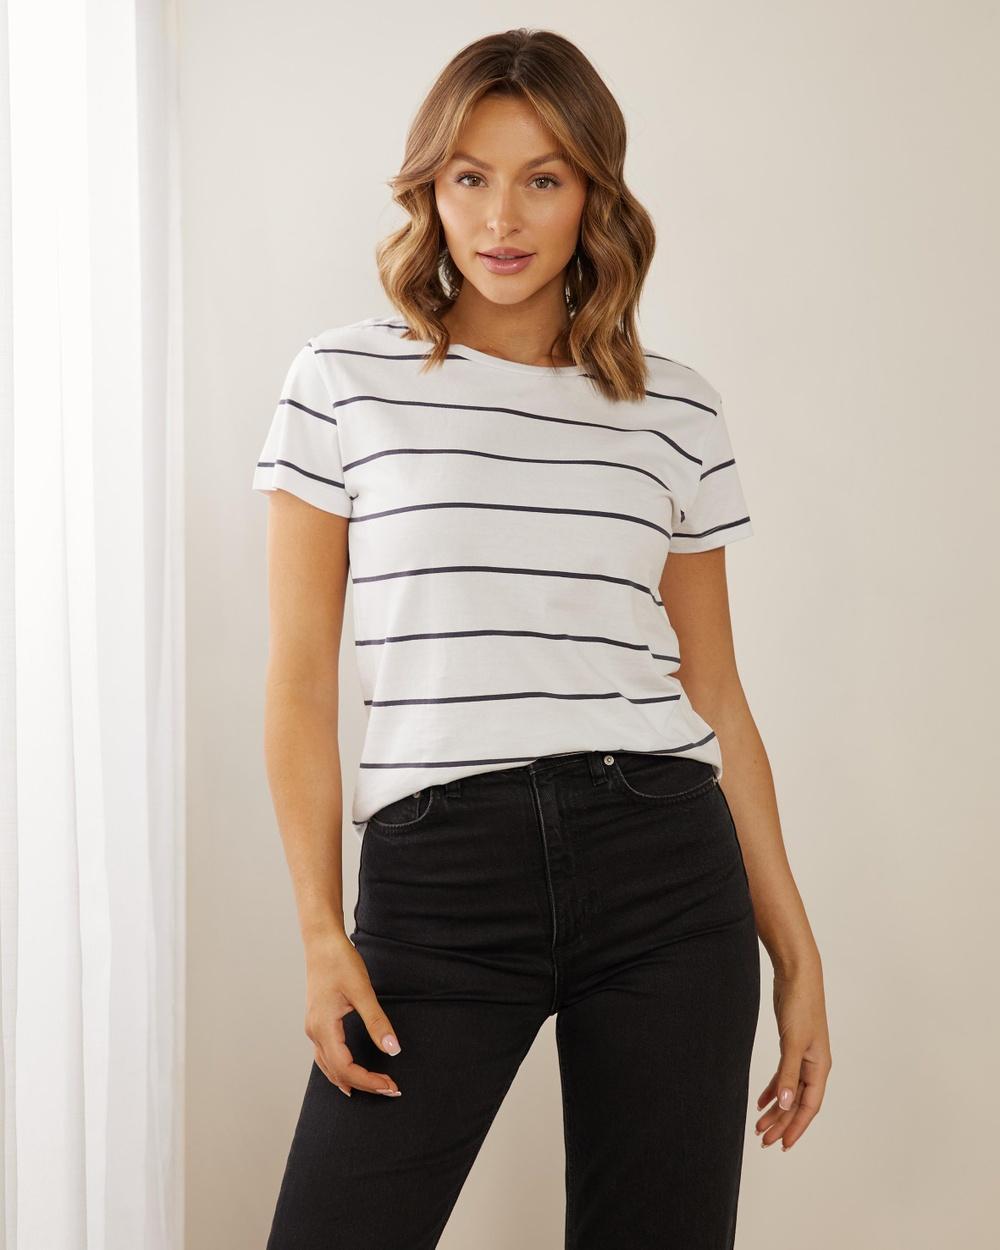 Atmos&Here Organic Cotton Crew Neck Tee T-Shirts & Singlets Navy And White Stripe Australia